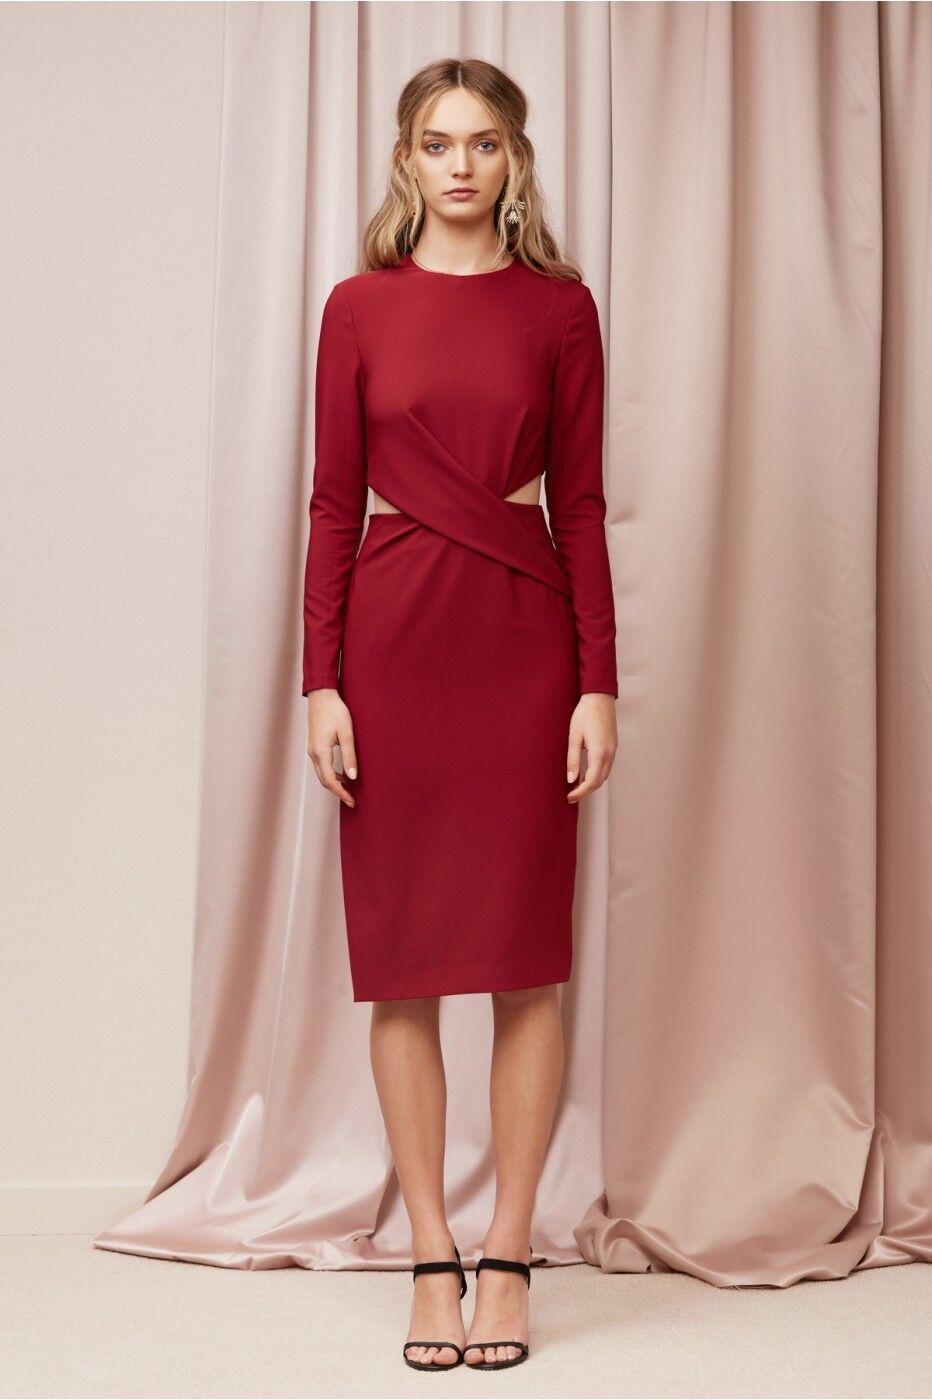 Finders Keepers F11 Women Revolution Cut Out Midi Sheath Dress Raspberry Size M